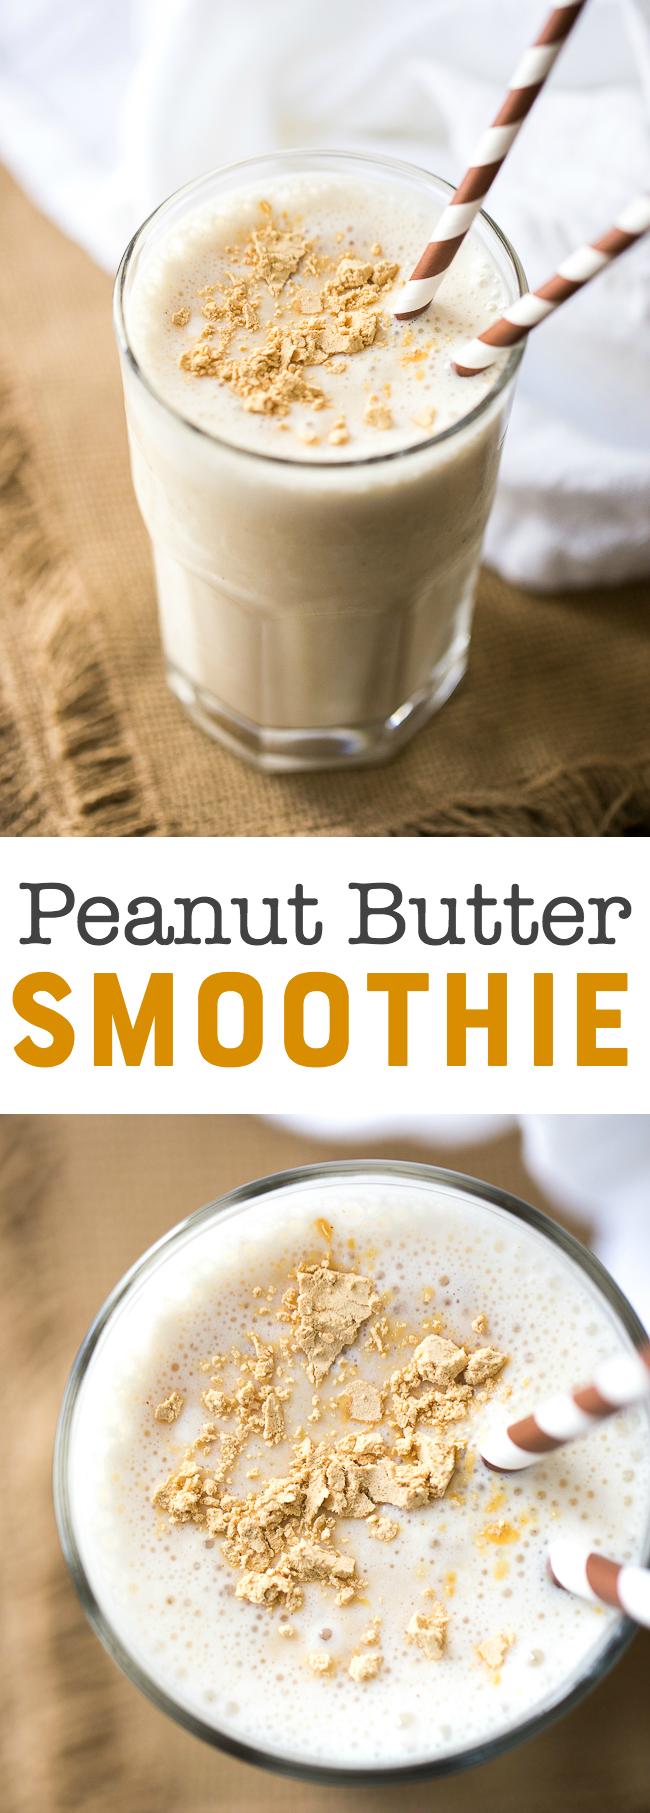 Peanut Butter Smoothie Recipe - PB2 Banana Smoothie #vanillayogurt